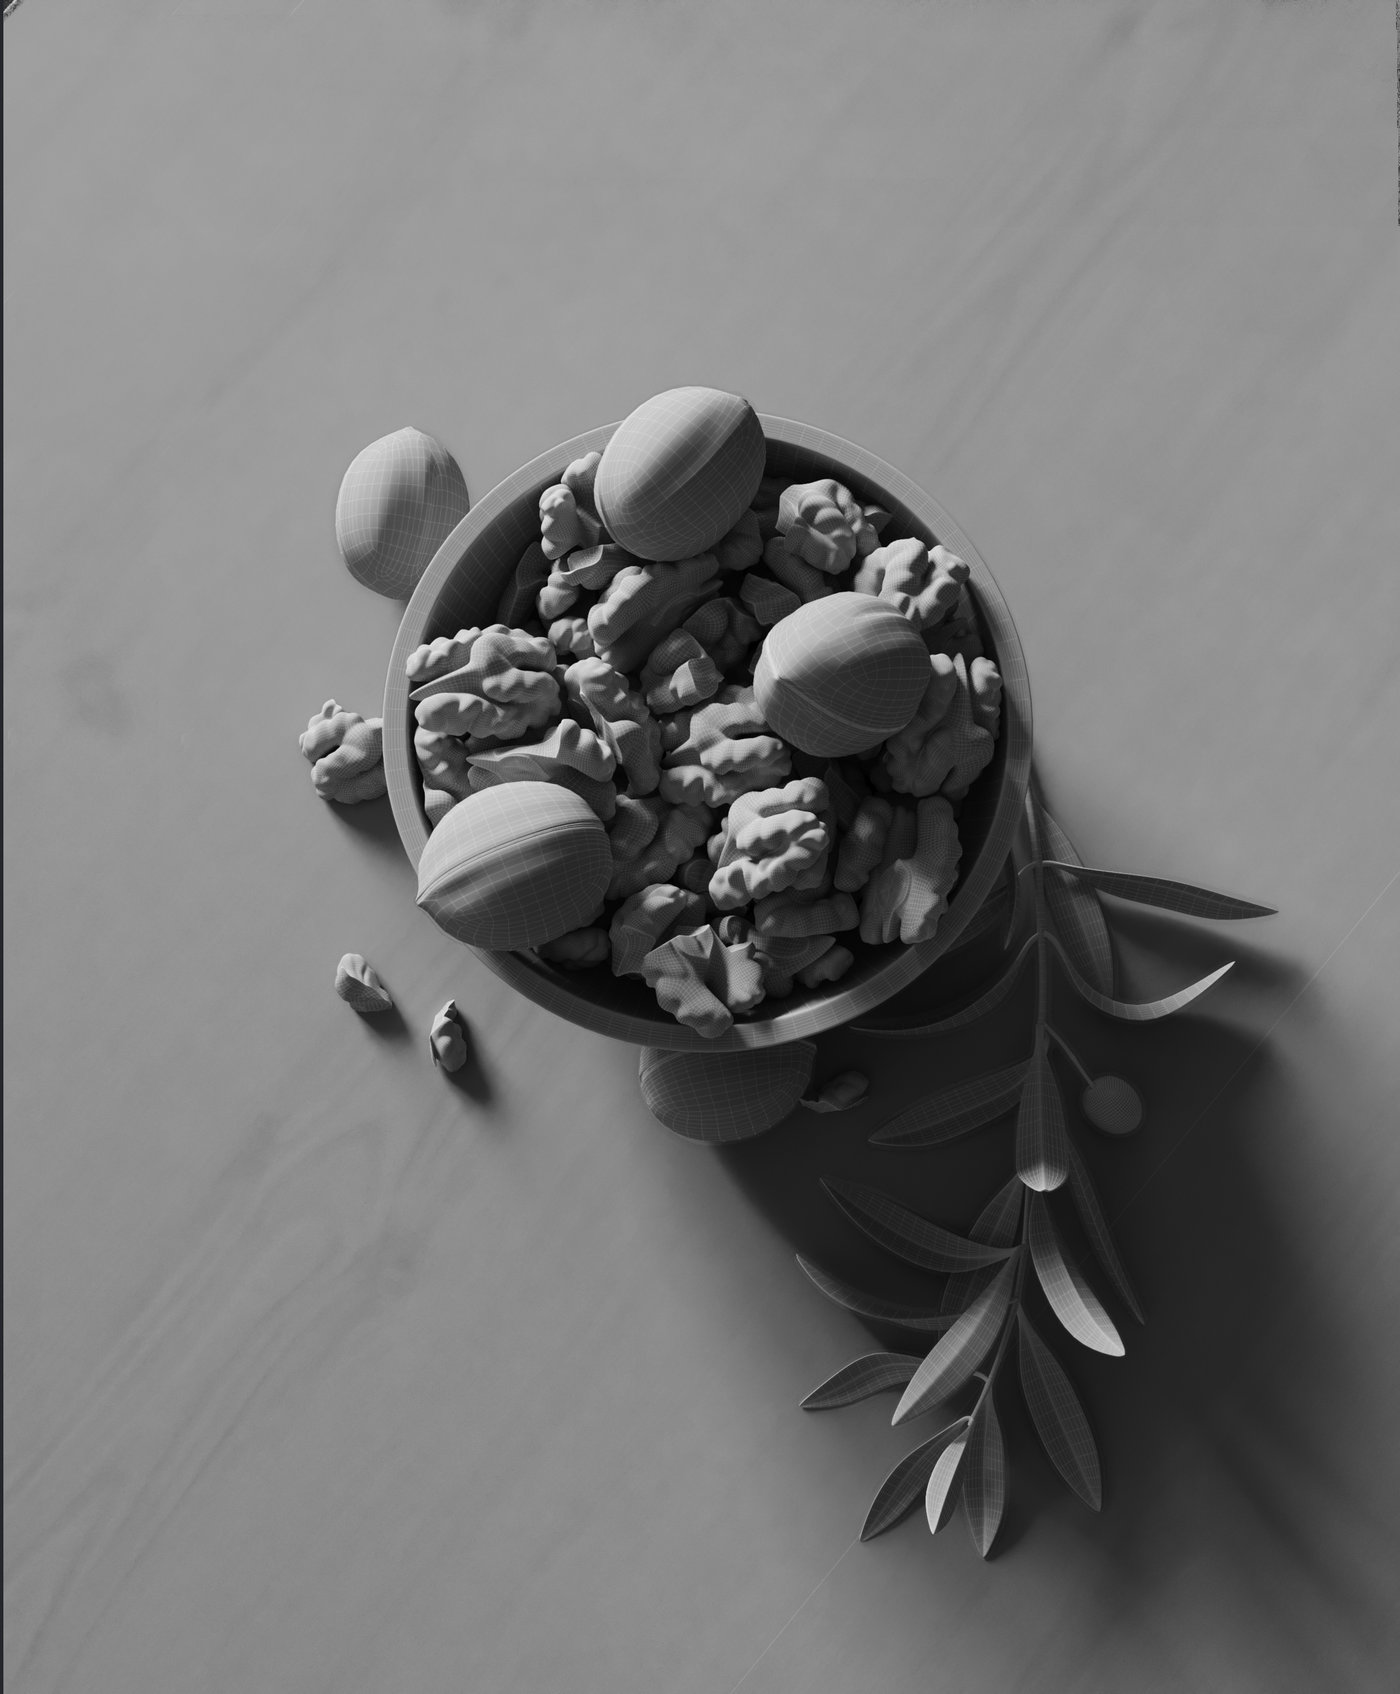 Morning nuts